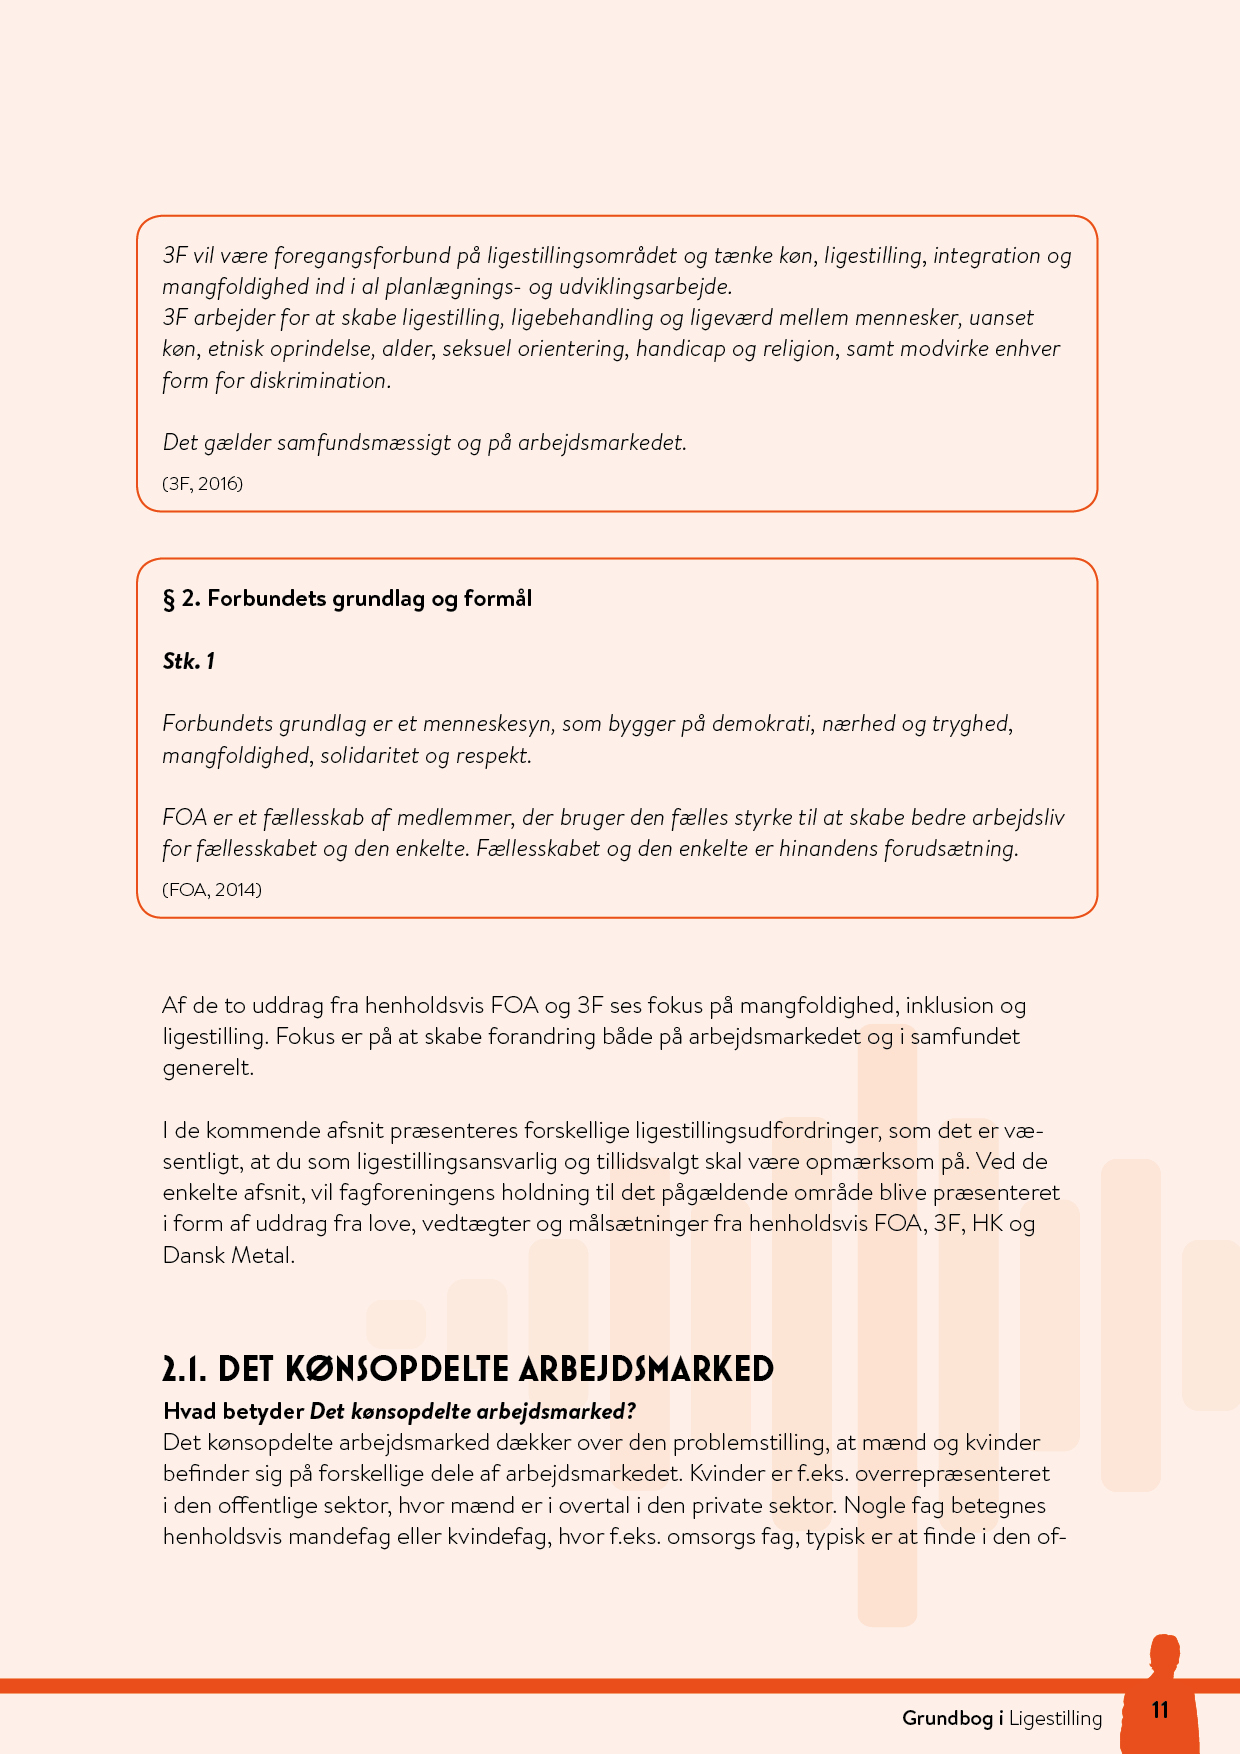 Grundbog i ligestilling_NET5